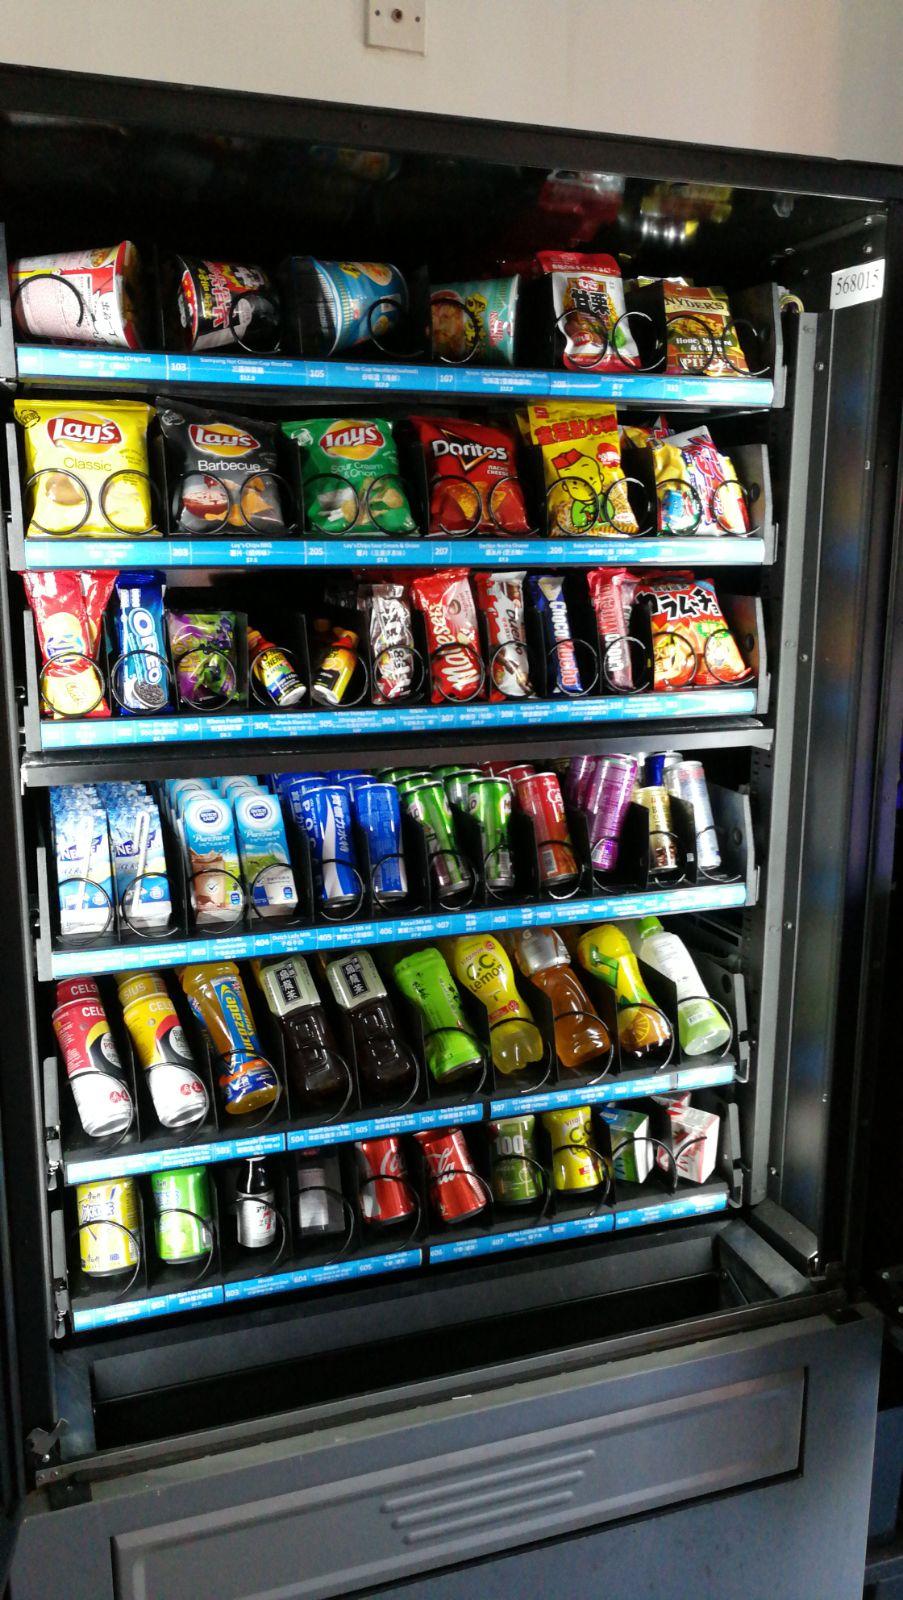 FreshUp,自動售賣機,自動販賣機,零食,飲品,方便,快捷,智能,學校,大學,香港理工大學